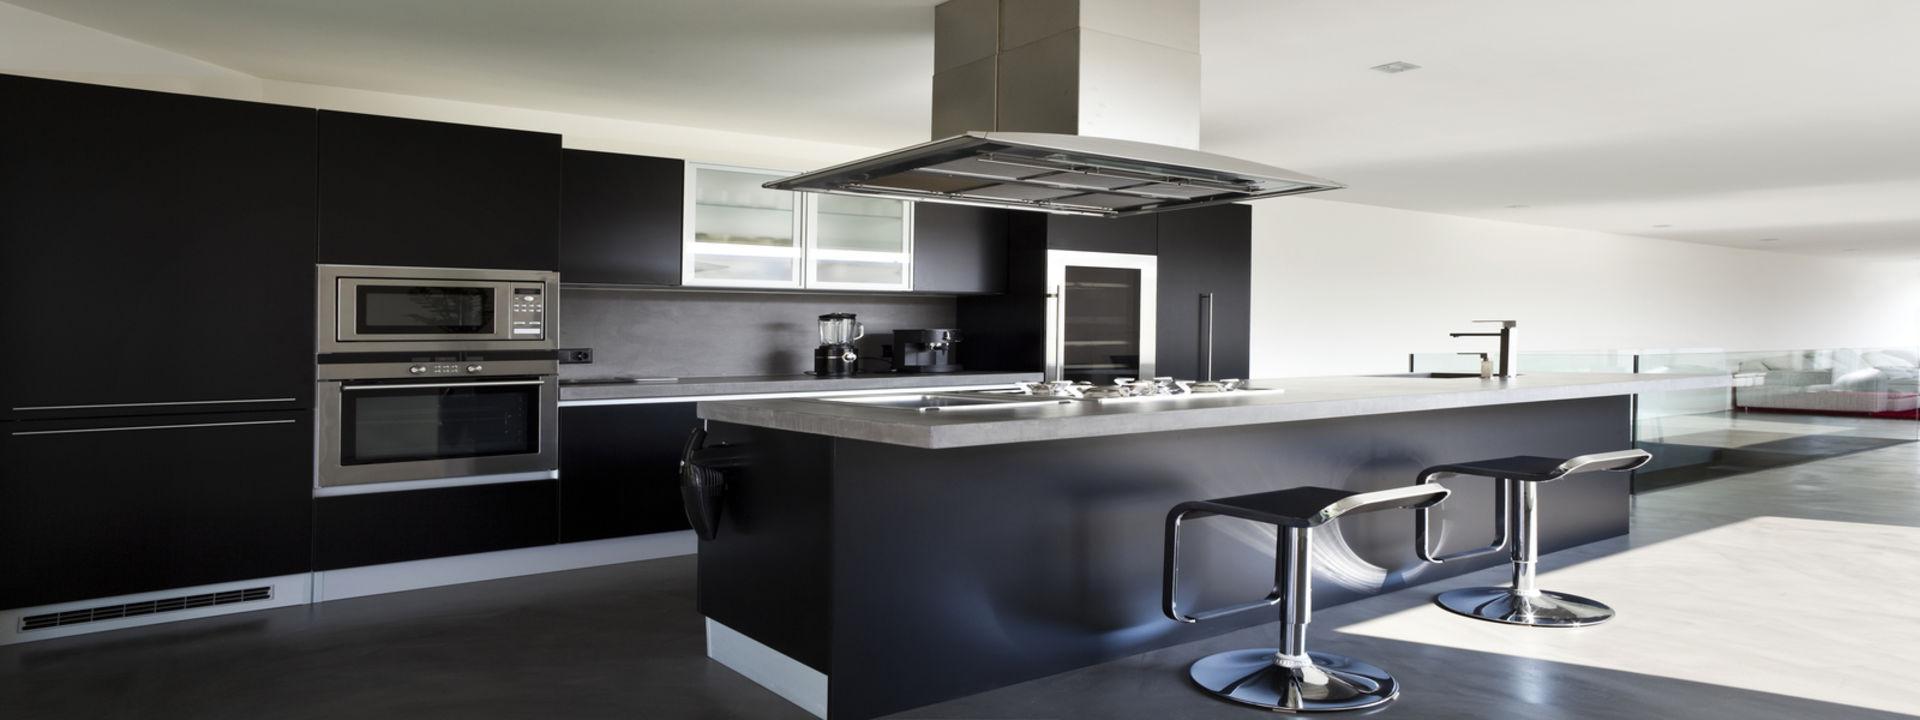 Boca Flores Homes for sale in Boca Raton